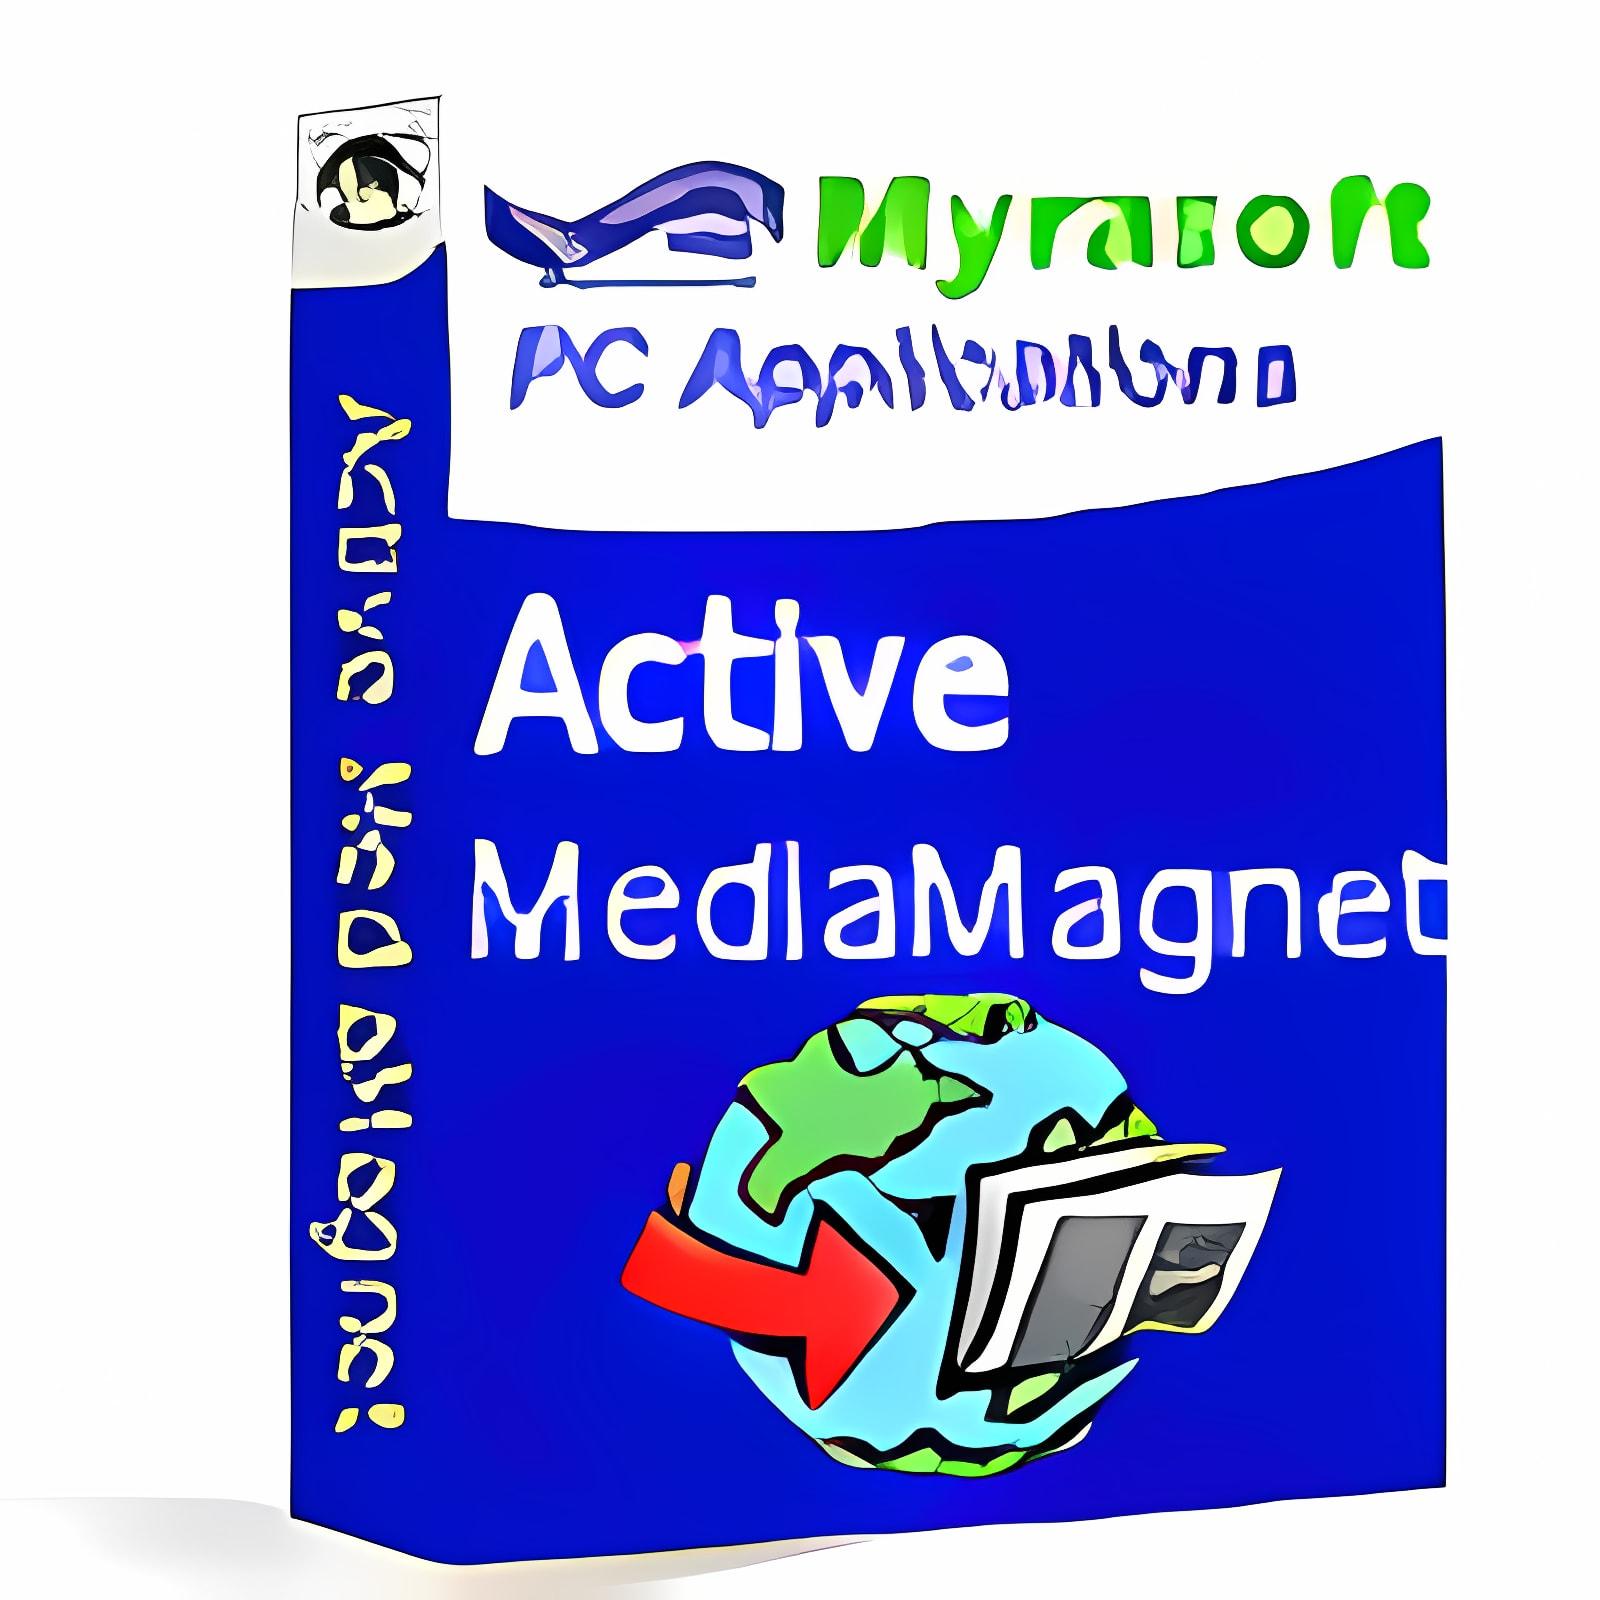 Active MediaMagnet